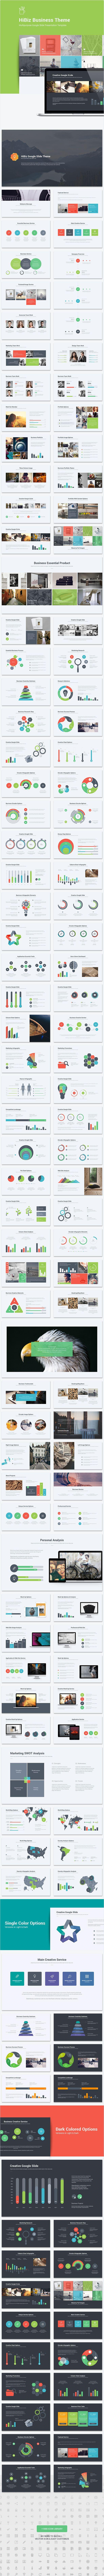 HiBiz Multipurpose Business Google Slides Template #design Download: http://graphicriver.net/item/hibiz-multipurpose-business-theme/13163520?ref=ksioks